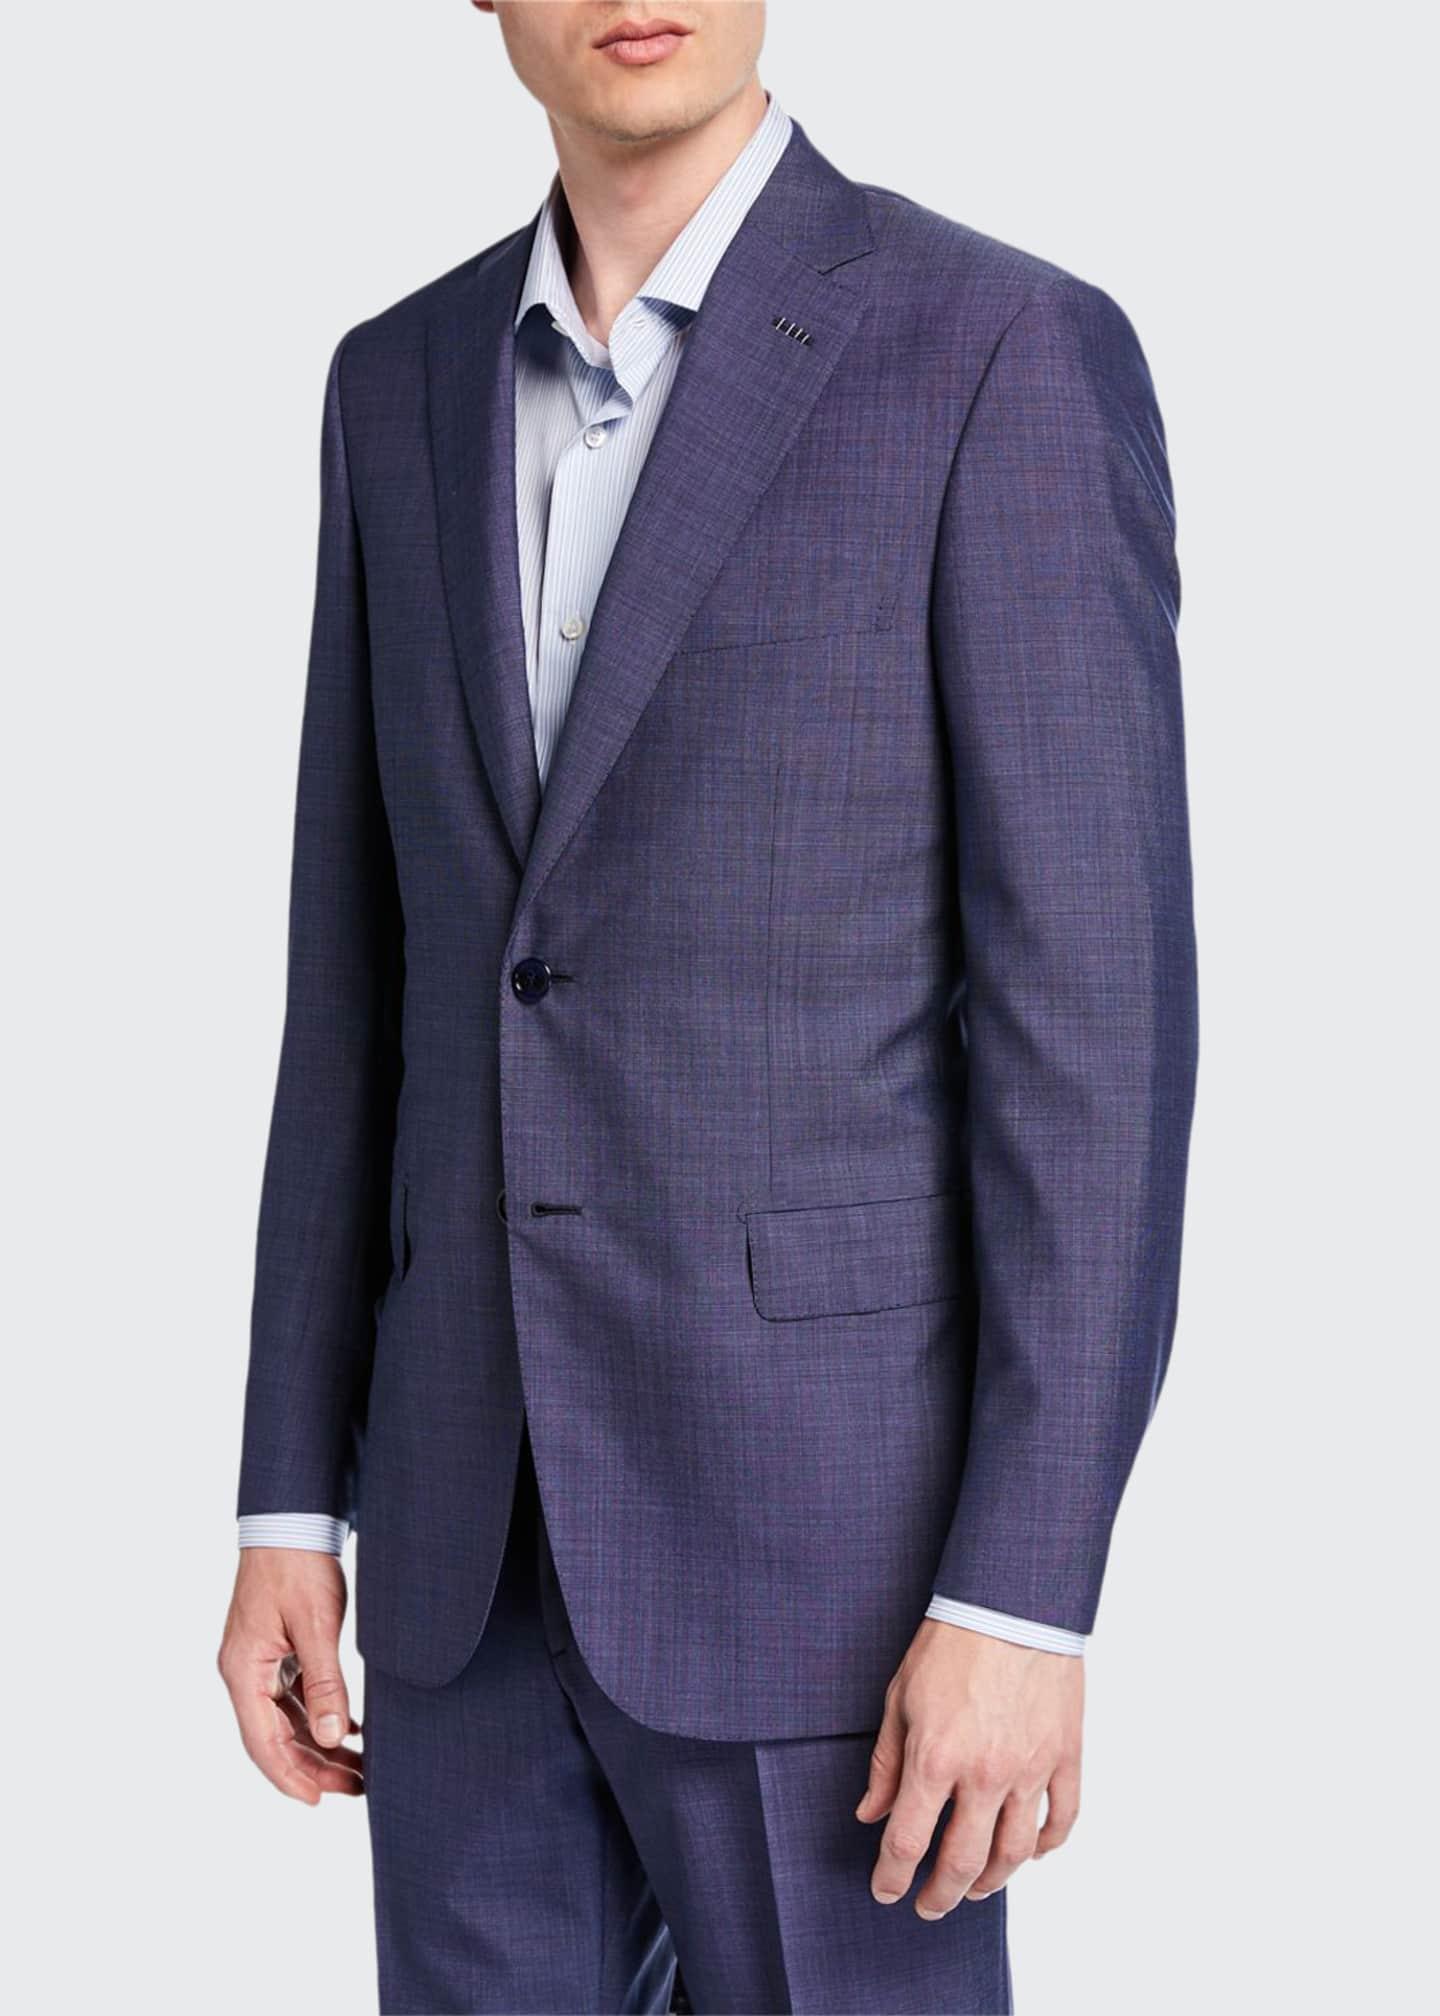 Brioni Men's Tic-Pattern Wool Two-Piece Suit